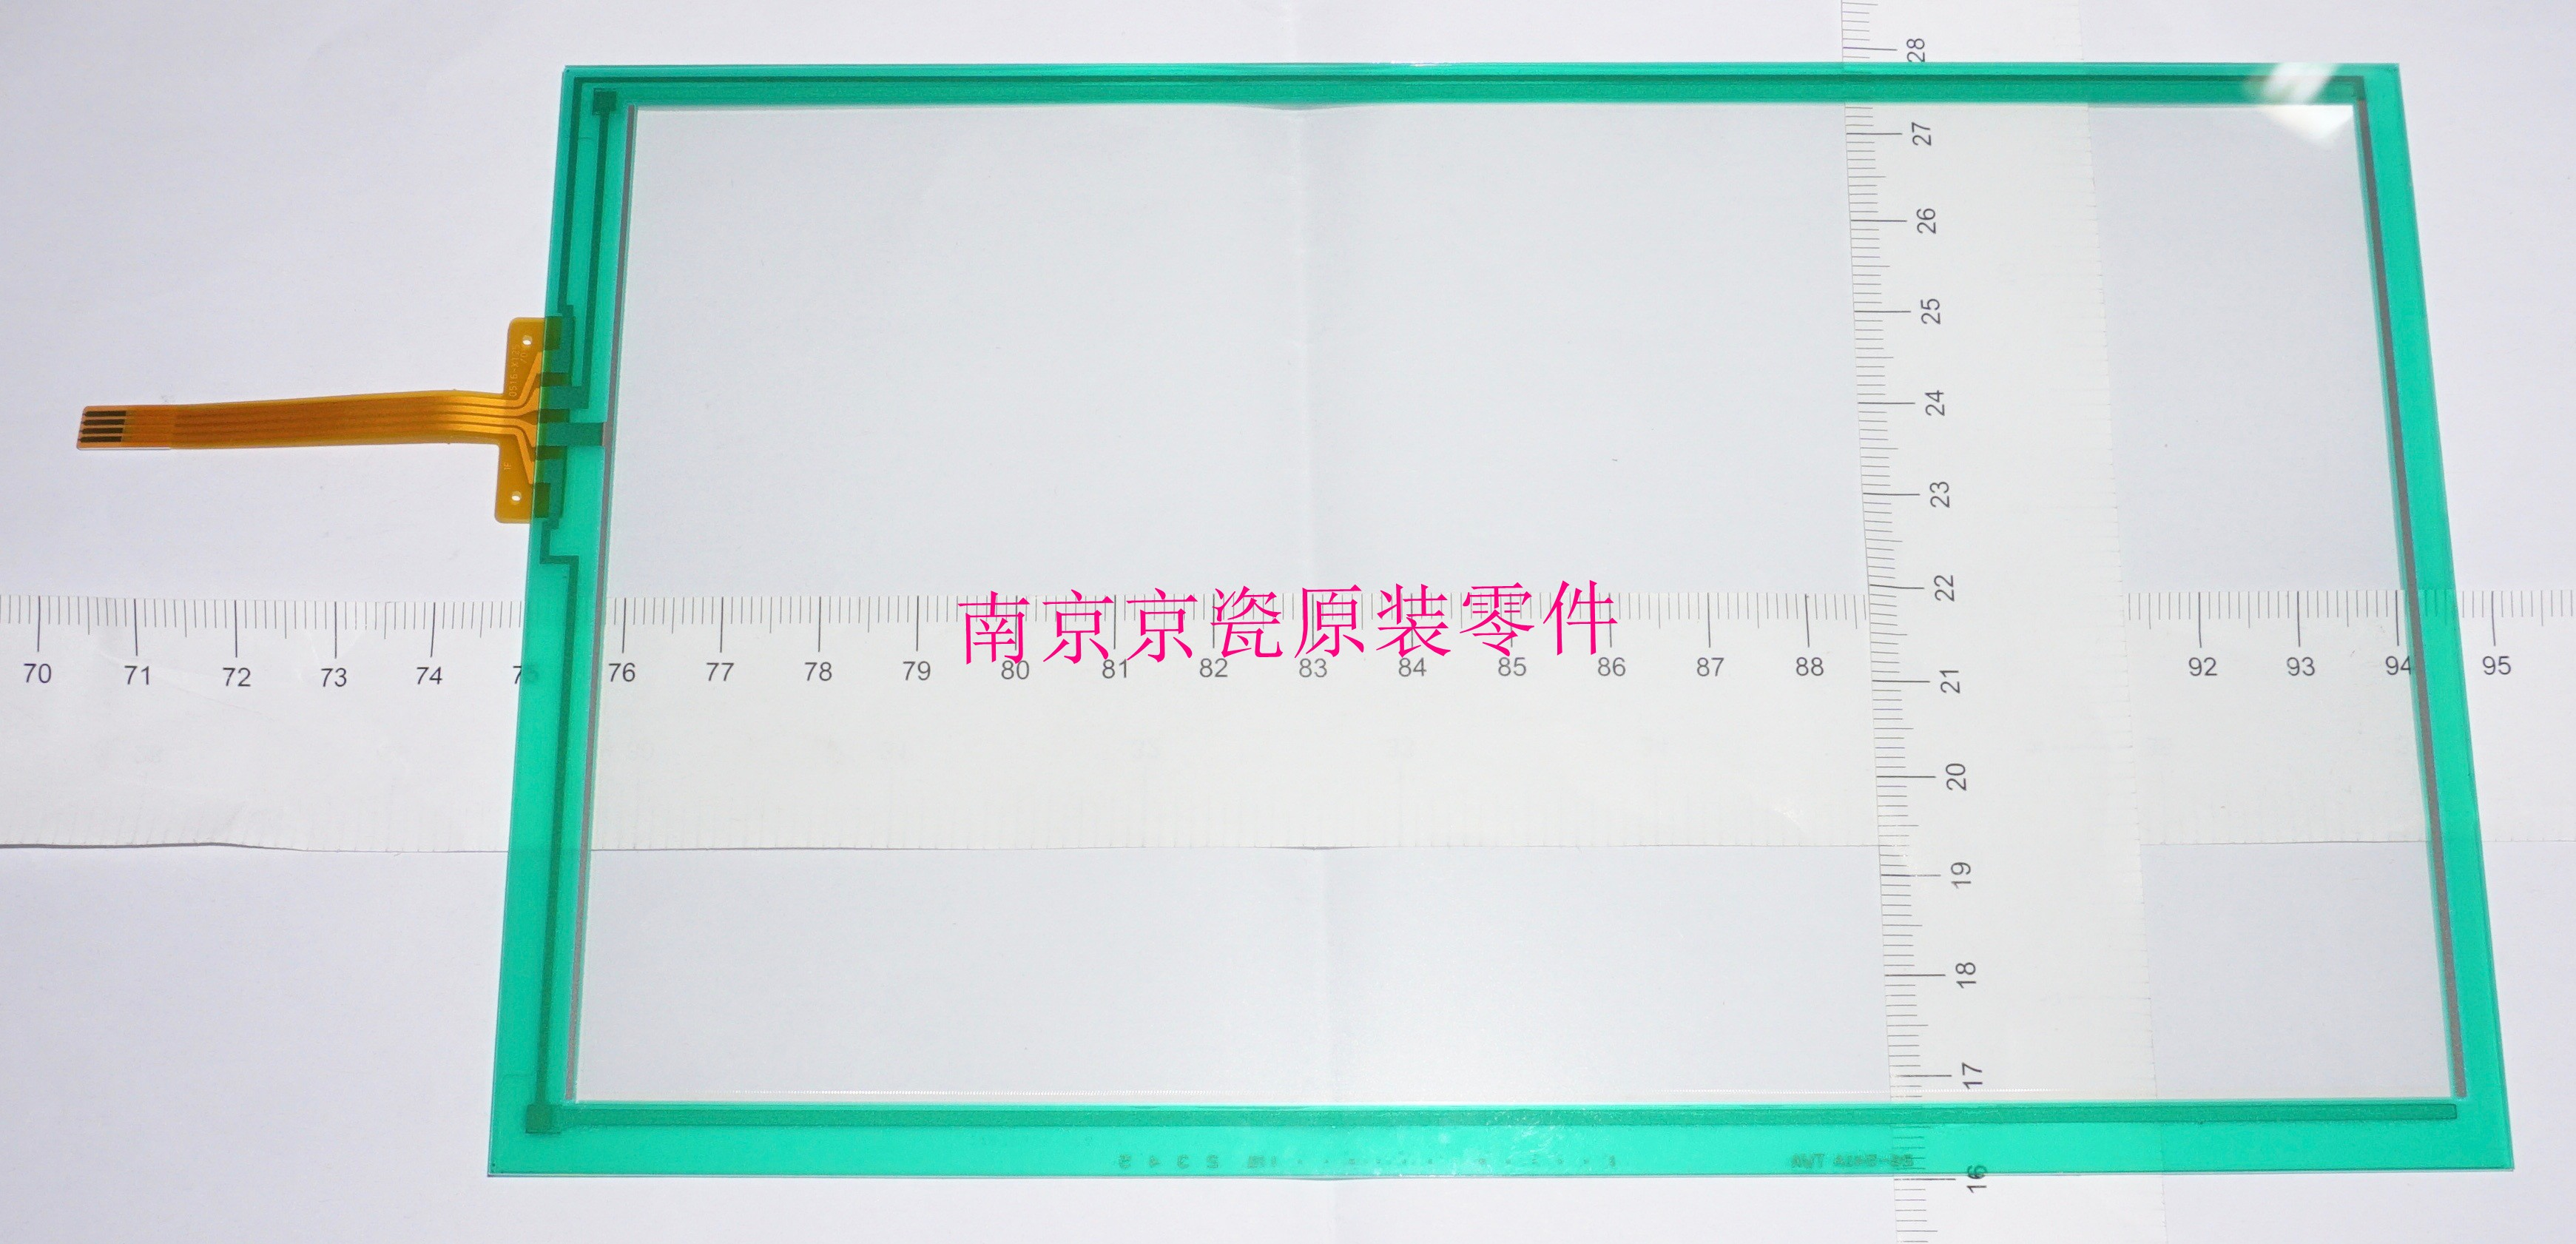 New Original Kyocera 302GR45050 TABLET OPERATION for:KM-5050 4050 3050New Original Kyocera 302GR45050 TABLET OPERATION for:KM-5050 4050 3050